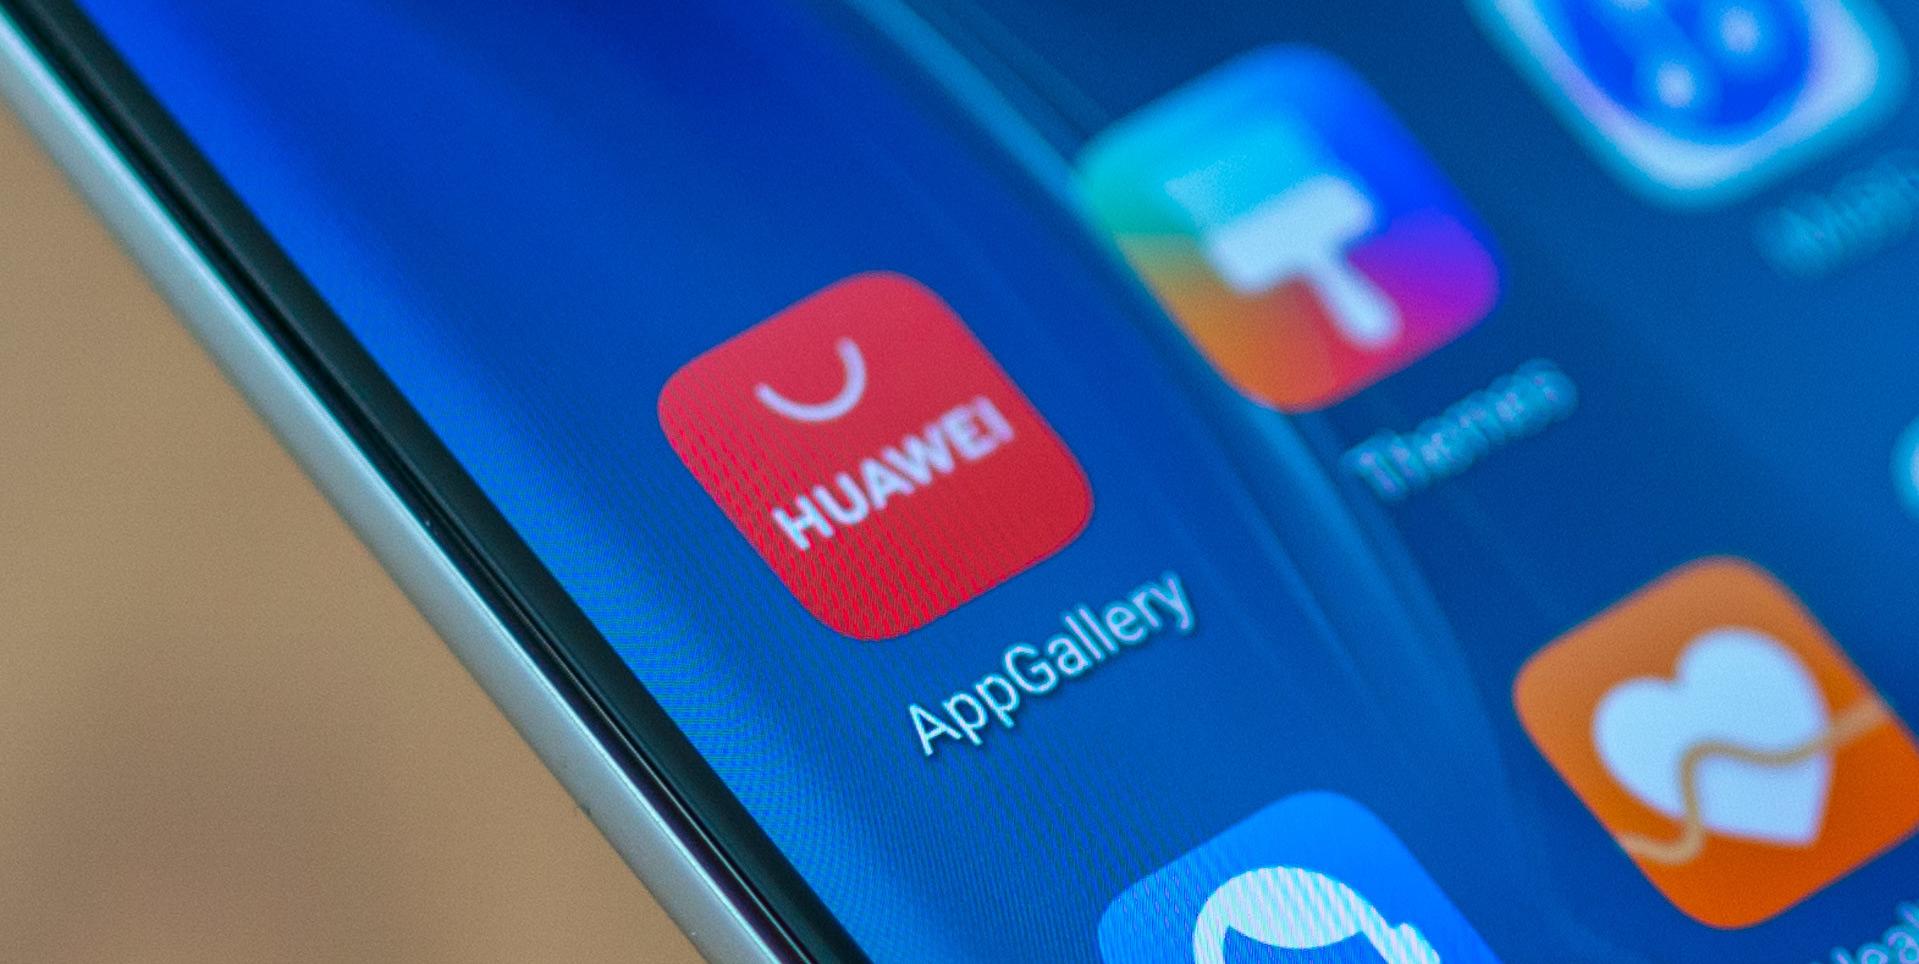 huawei-p40-pro-huawei-app-gallery-icon.jpg